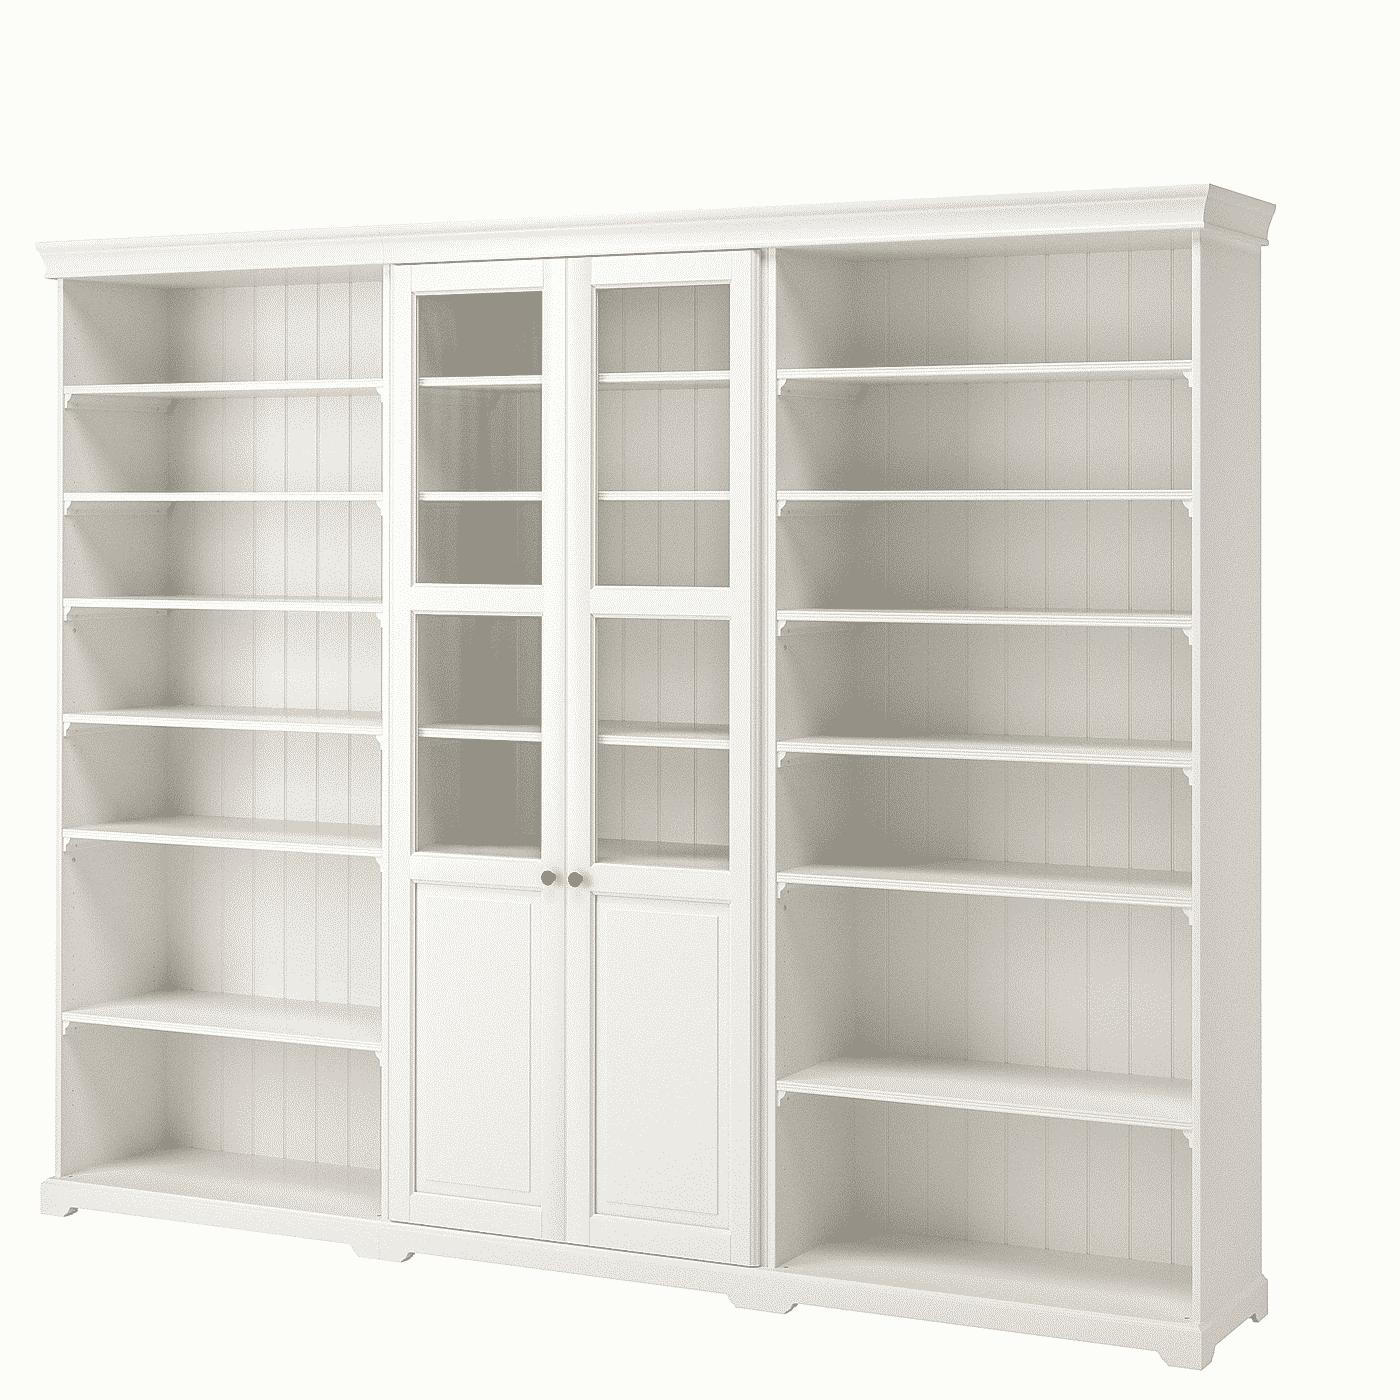 The LIATORP Bookshelf 2